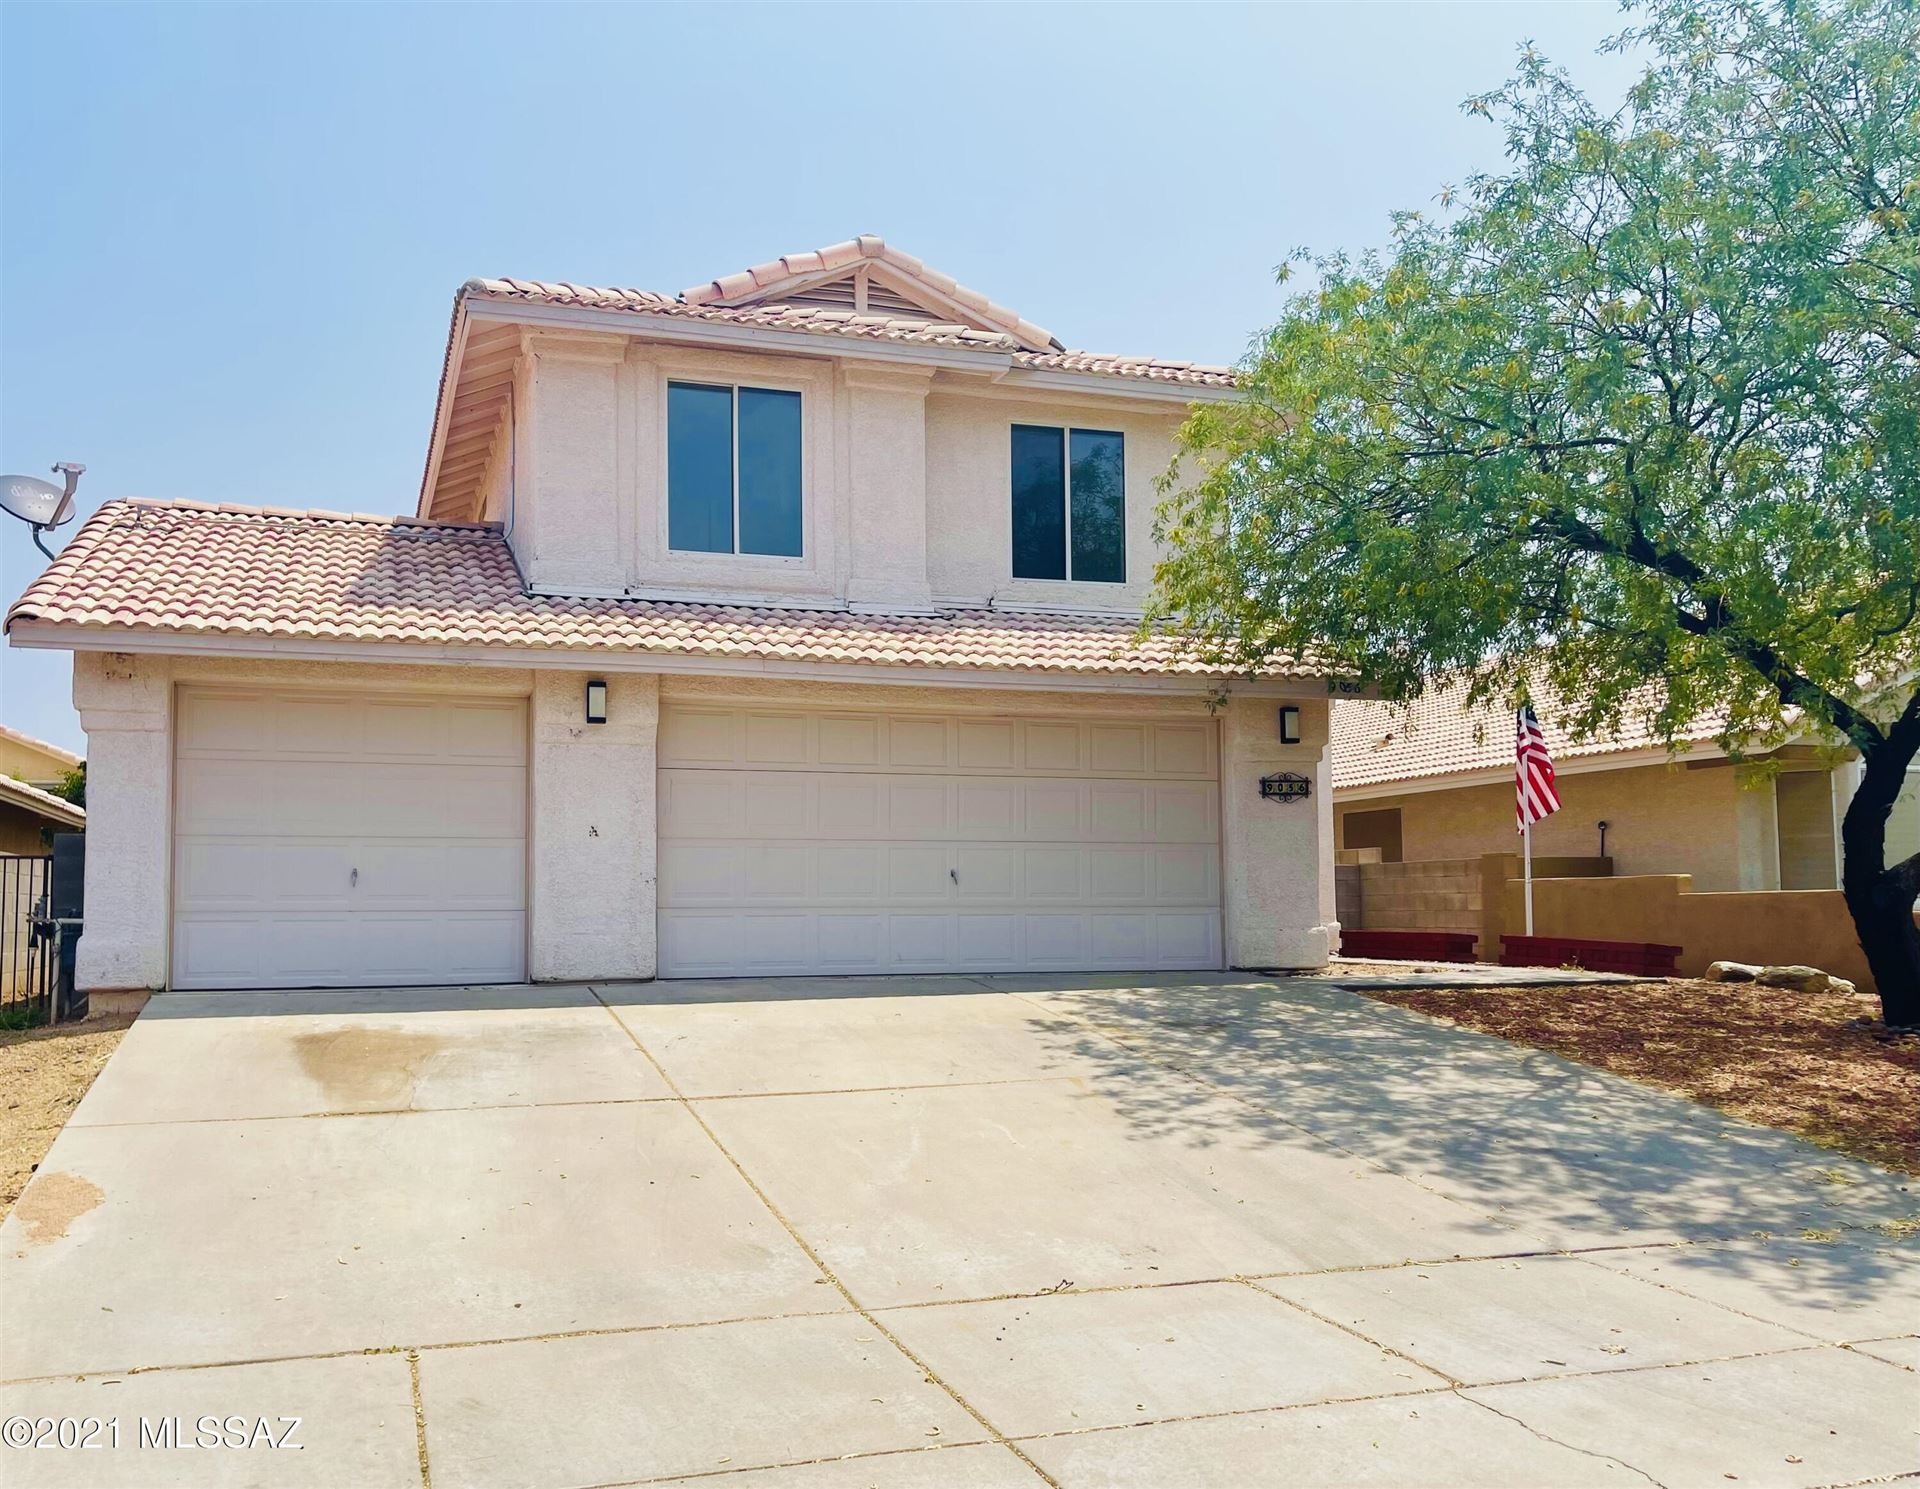 9056 N Wild Eagle Avenue, Tucson, AZ 85742 - MLS#: 22118767